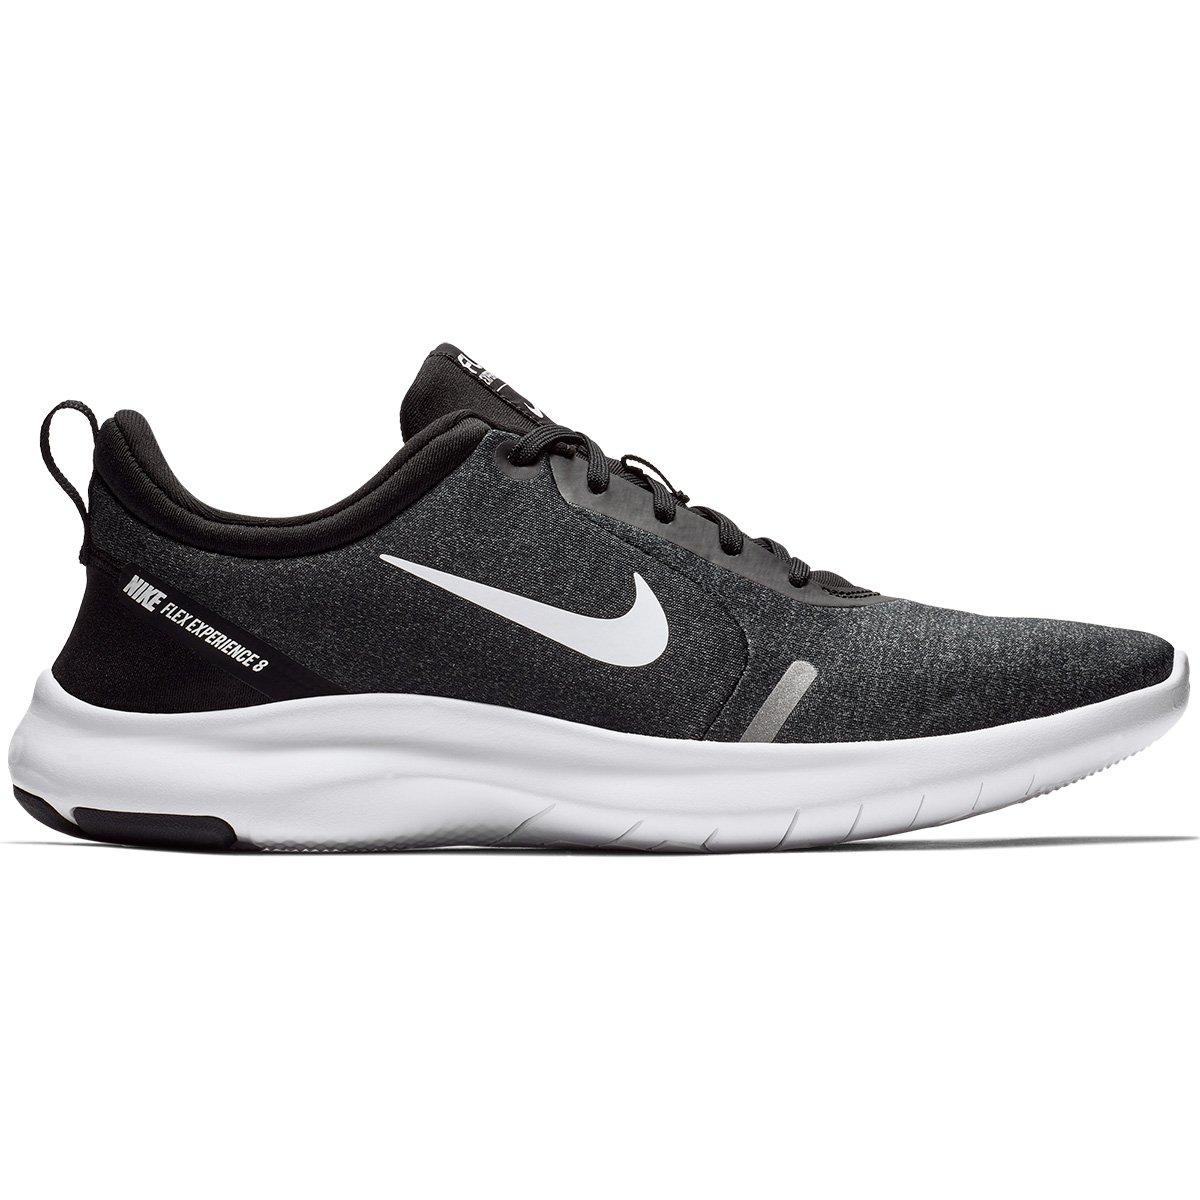 0f63eae8a8096 Tênis Nike Flex Experience Rn 8 Masculino - Preto e Branco - Compre Agora